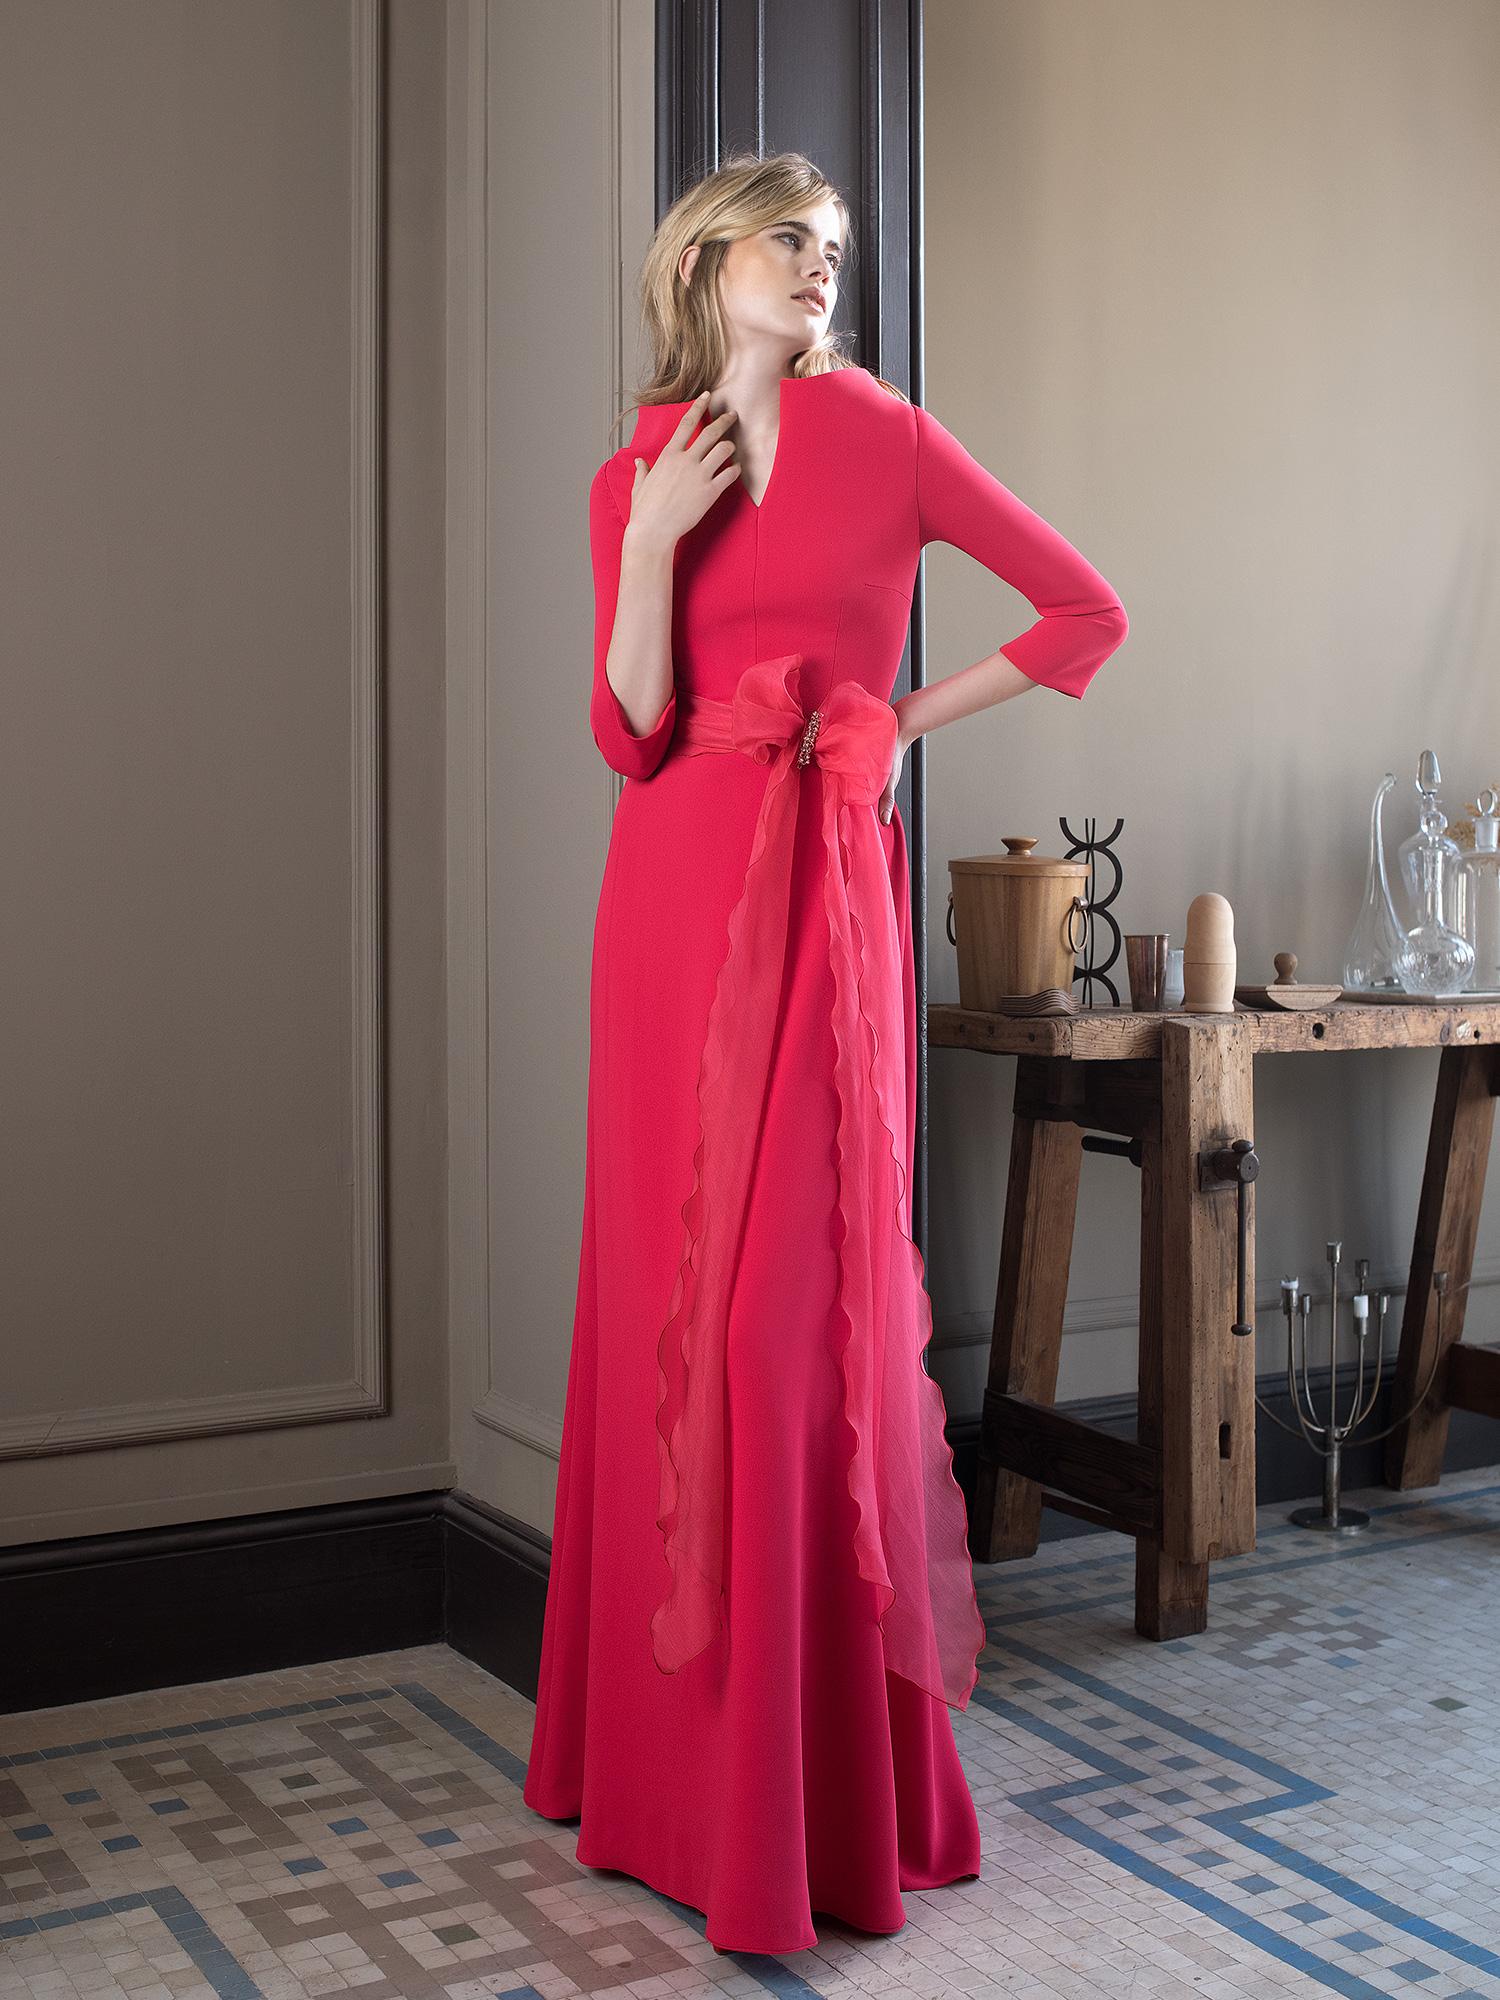 inmaculada-garcia-barcelona-vestidos-novia-donata_01